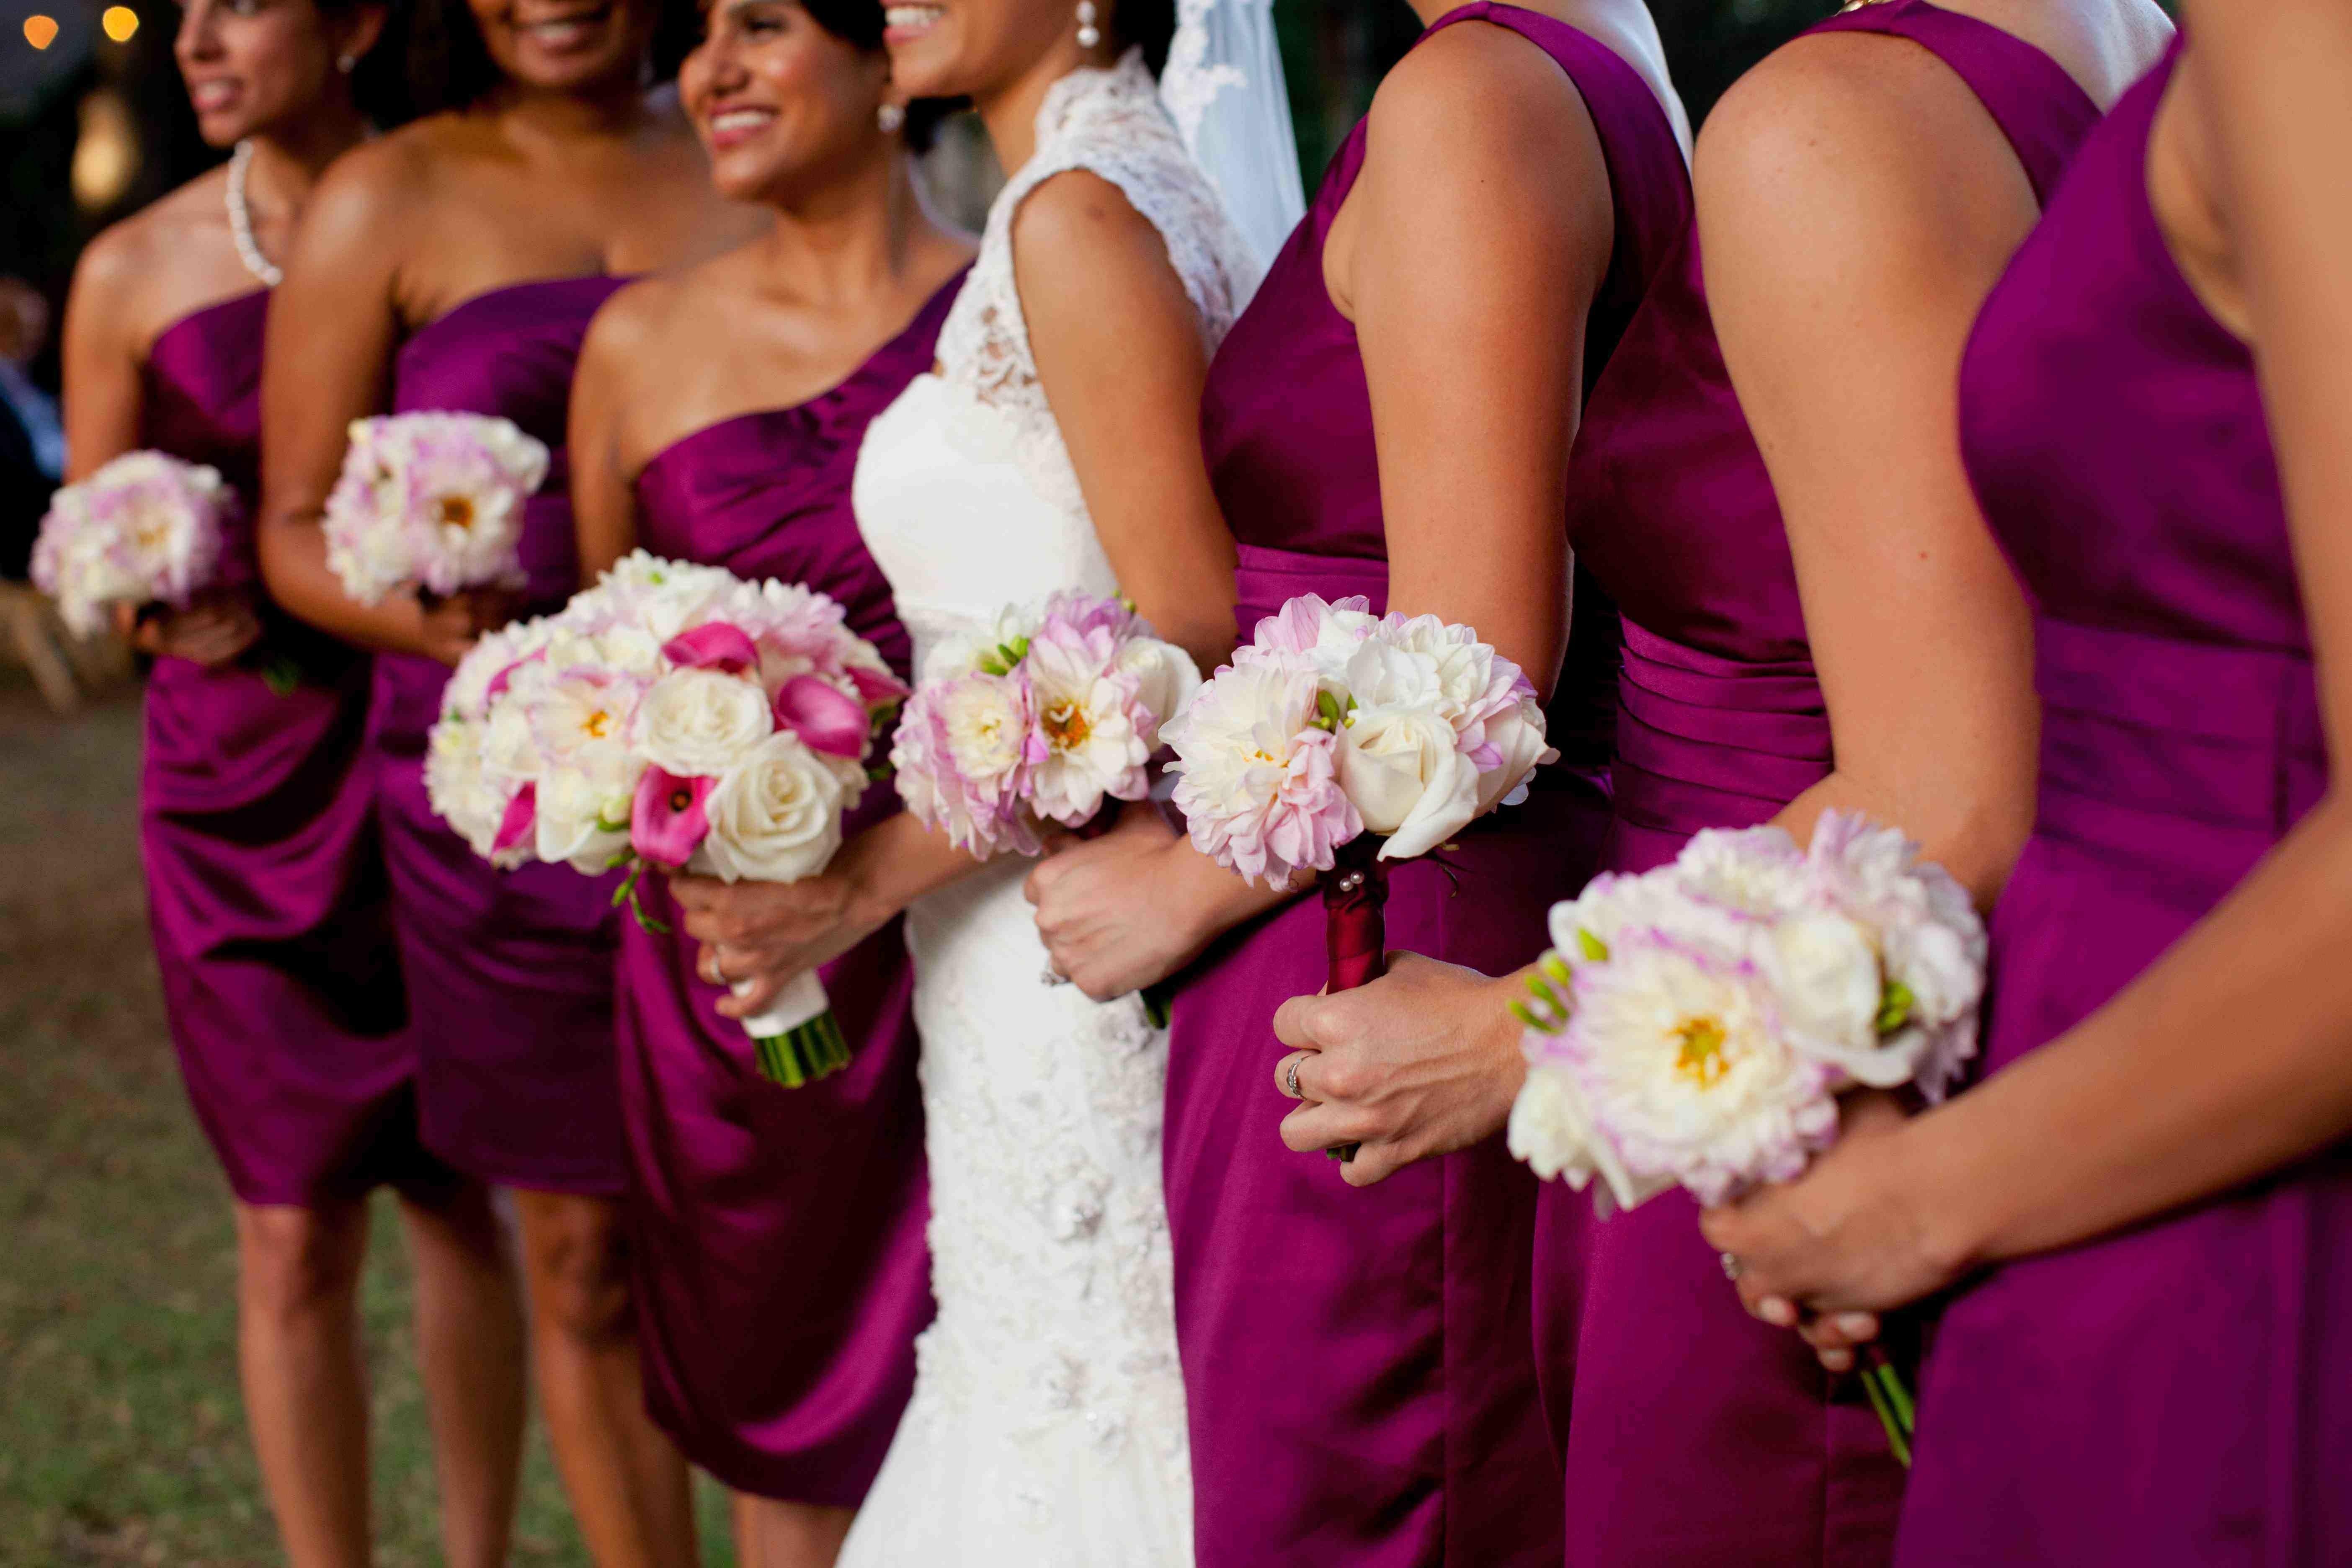 8defbc356e3 Bridesmaids Sangria dresses from David s Bridal online. sangria is a nice  color!